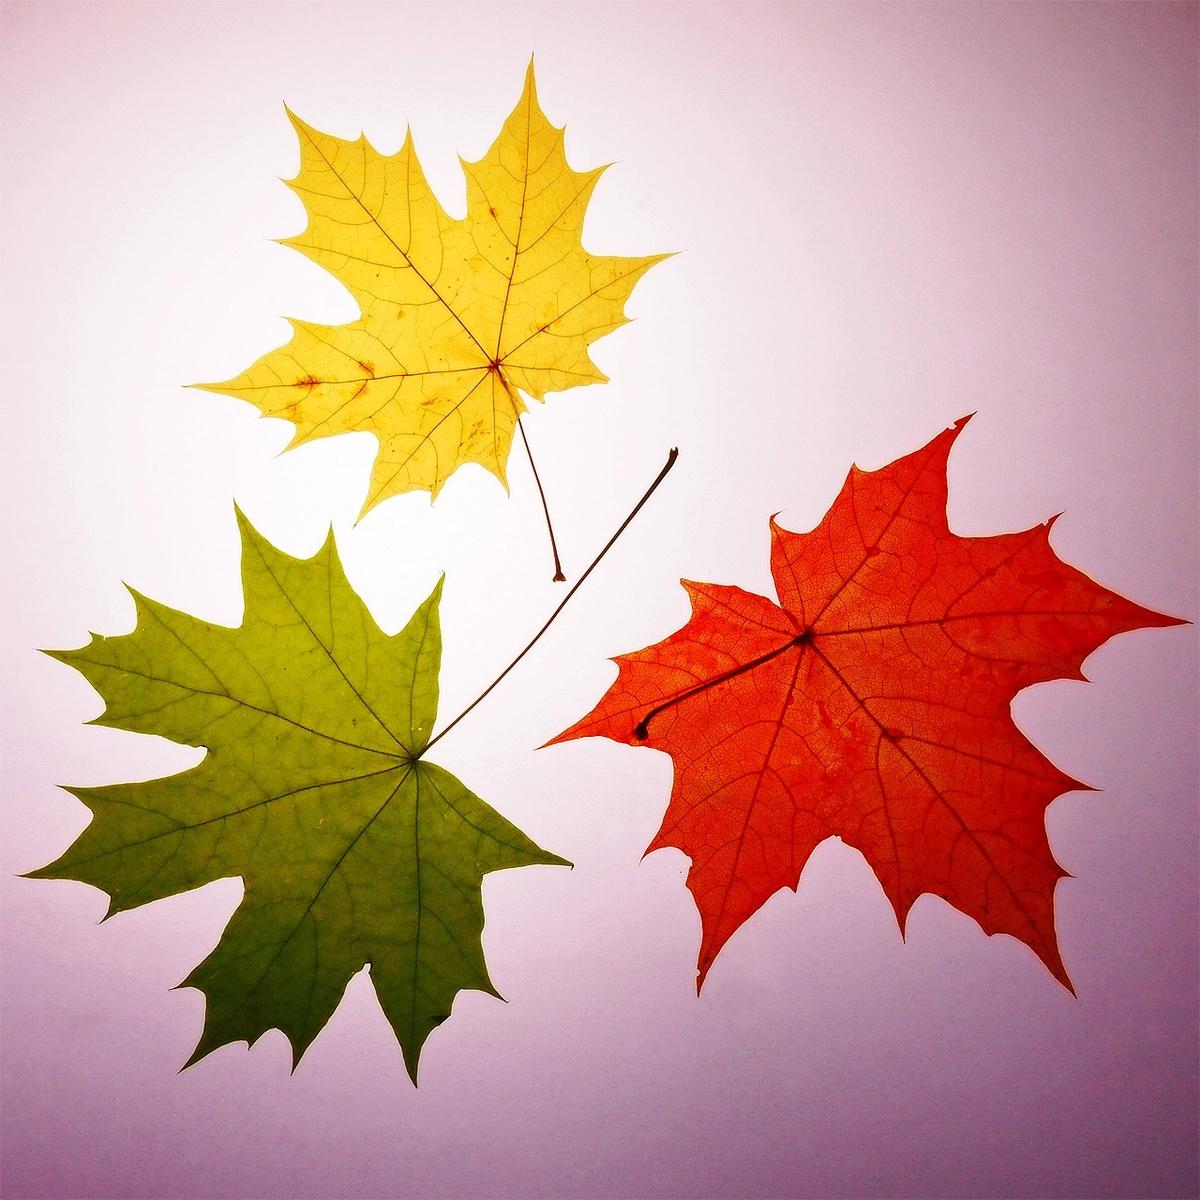 нас когда-то картинки про листья признался